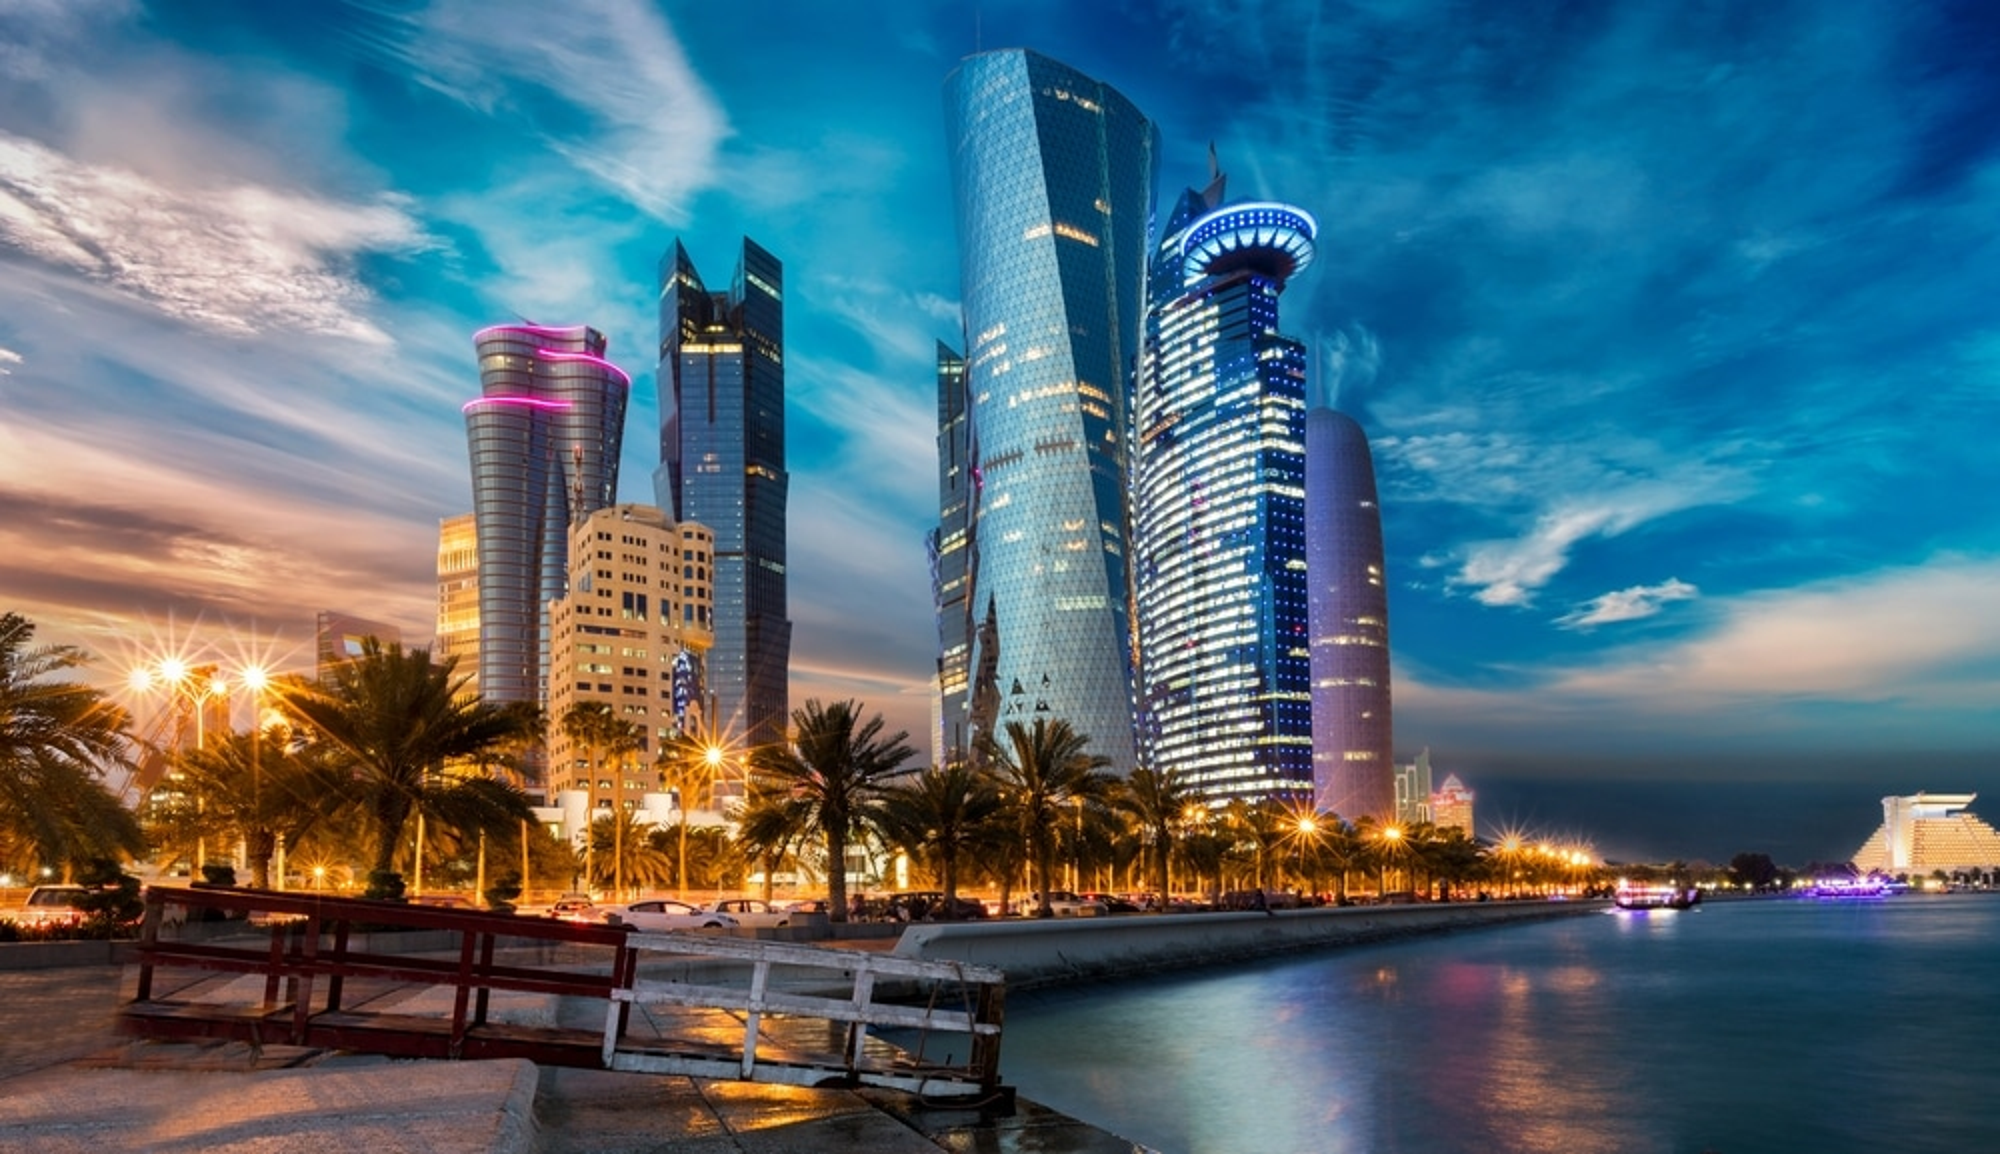 Skyline de Doha a Qatar